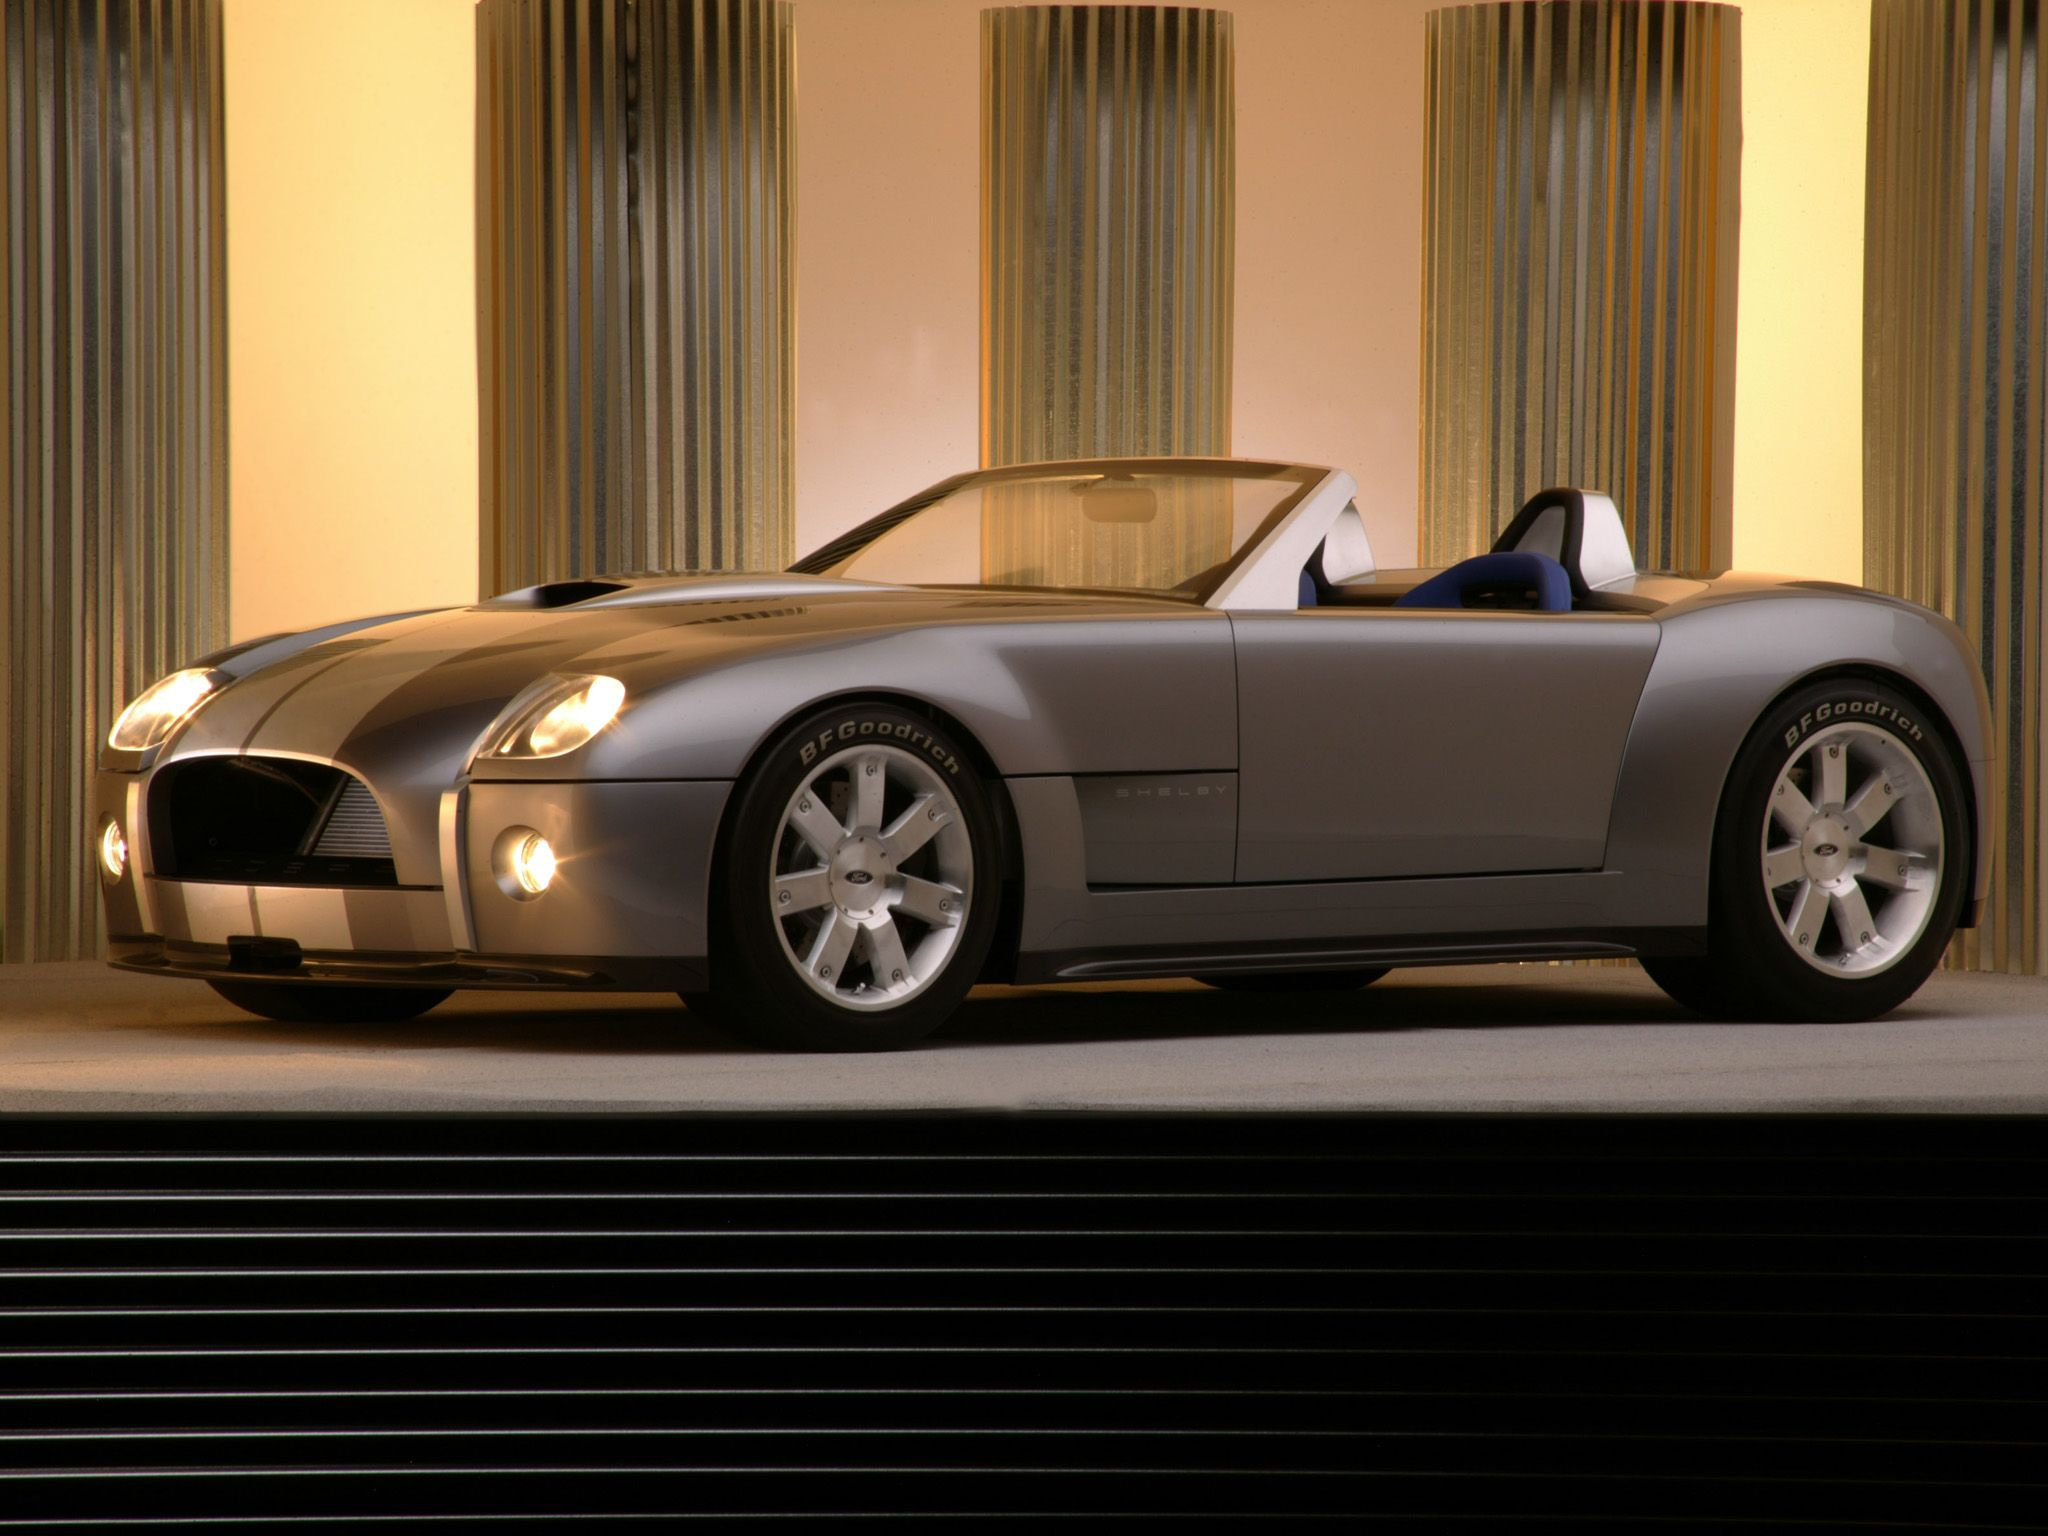 V10 Powered Ford Shelby Cobra Concept Up For Bidding In November